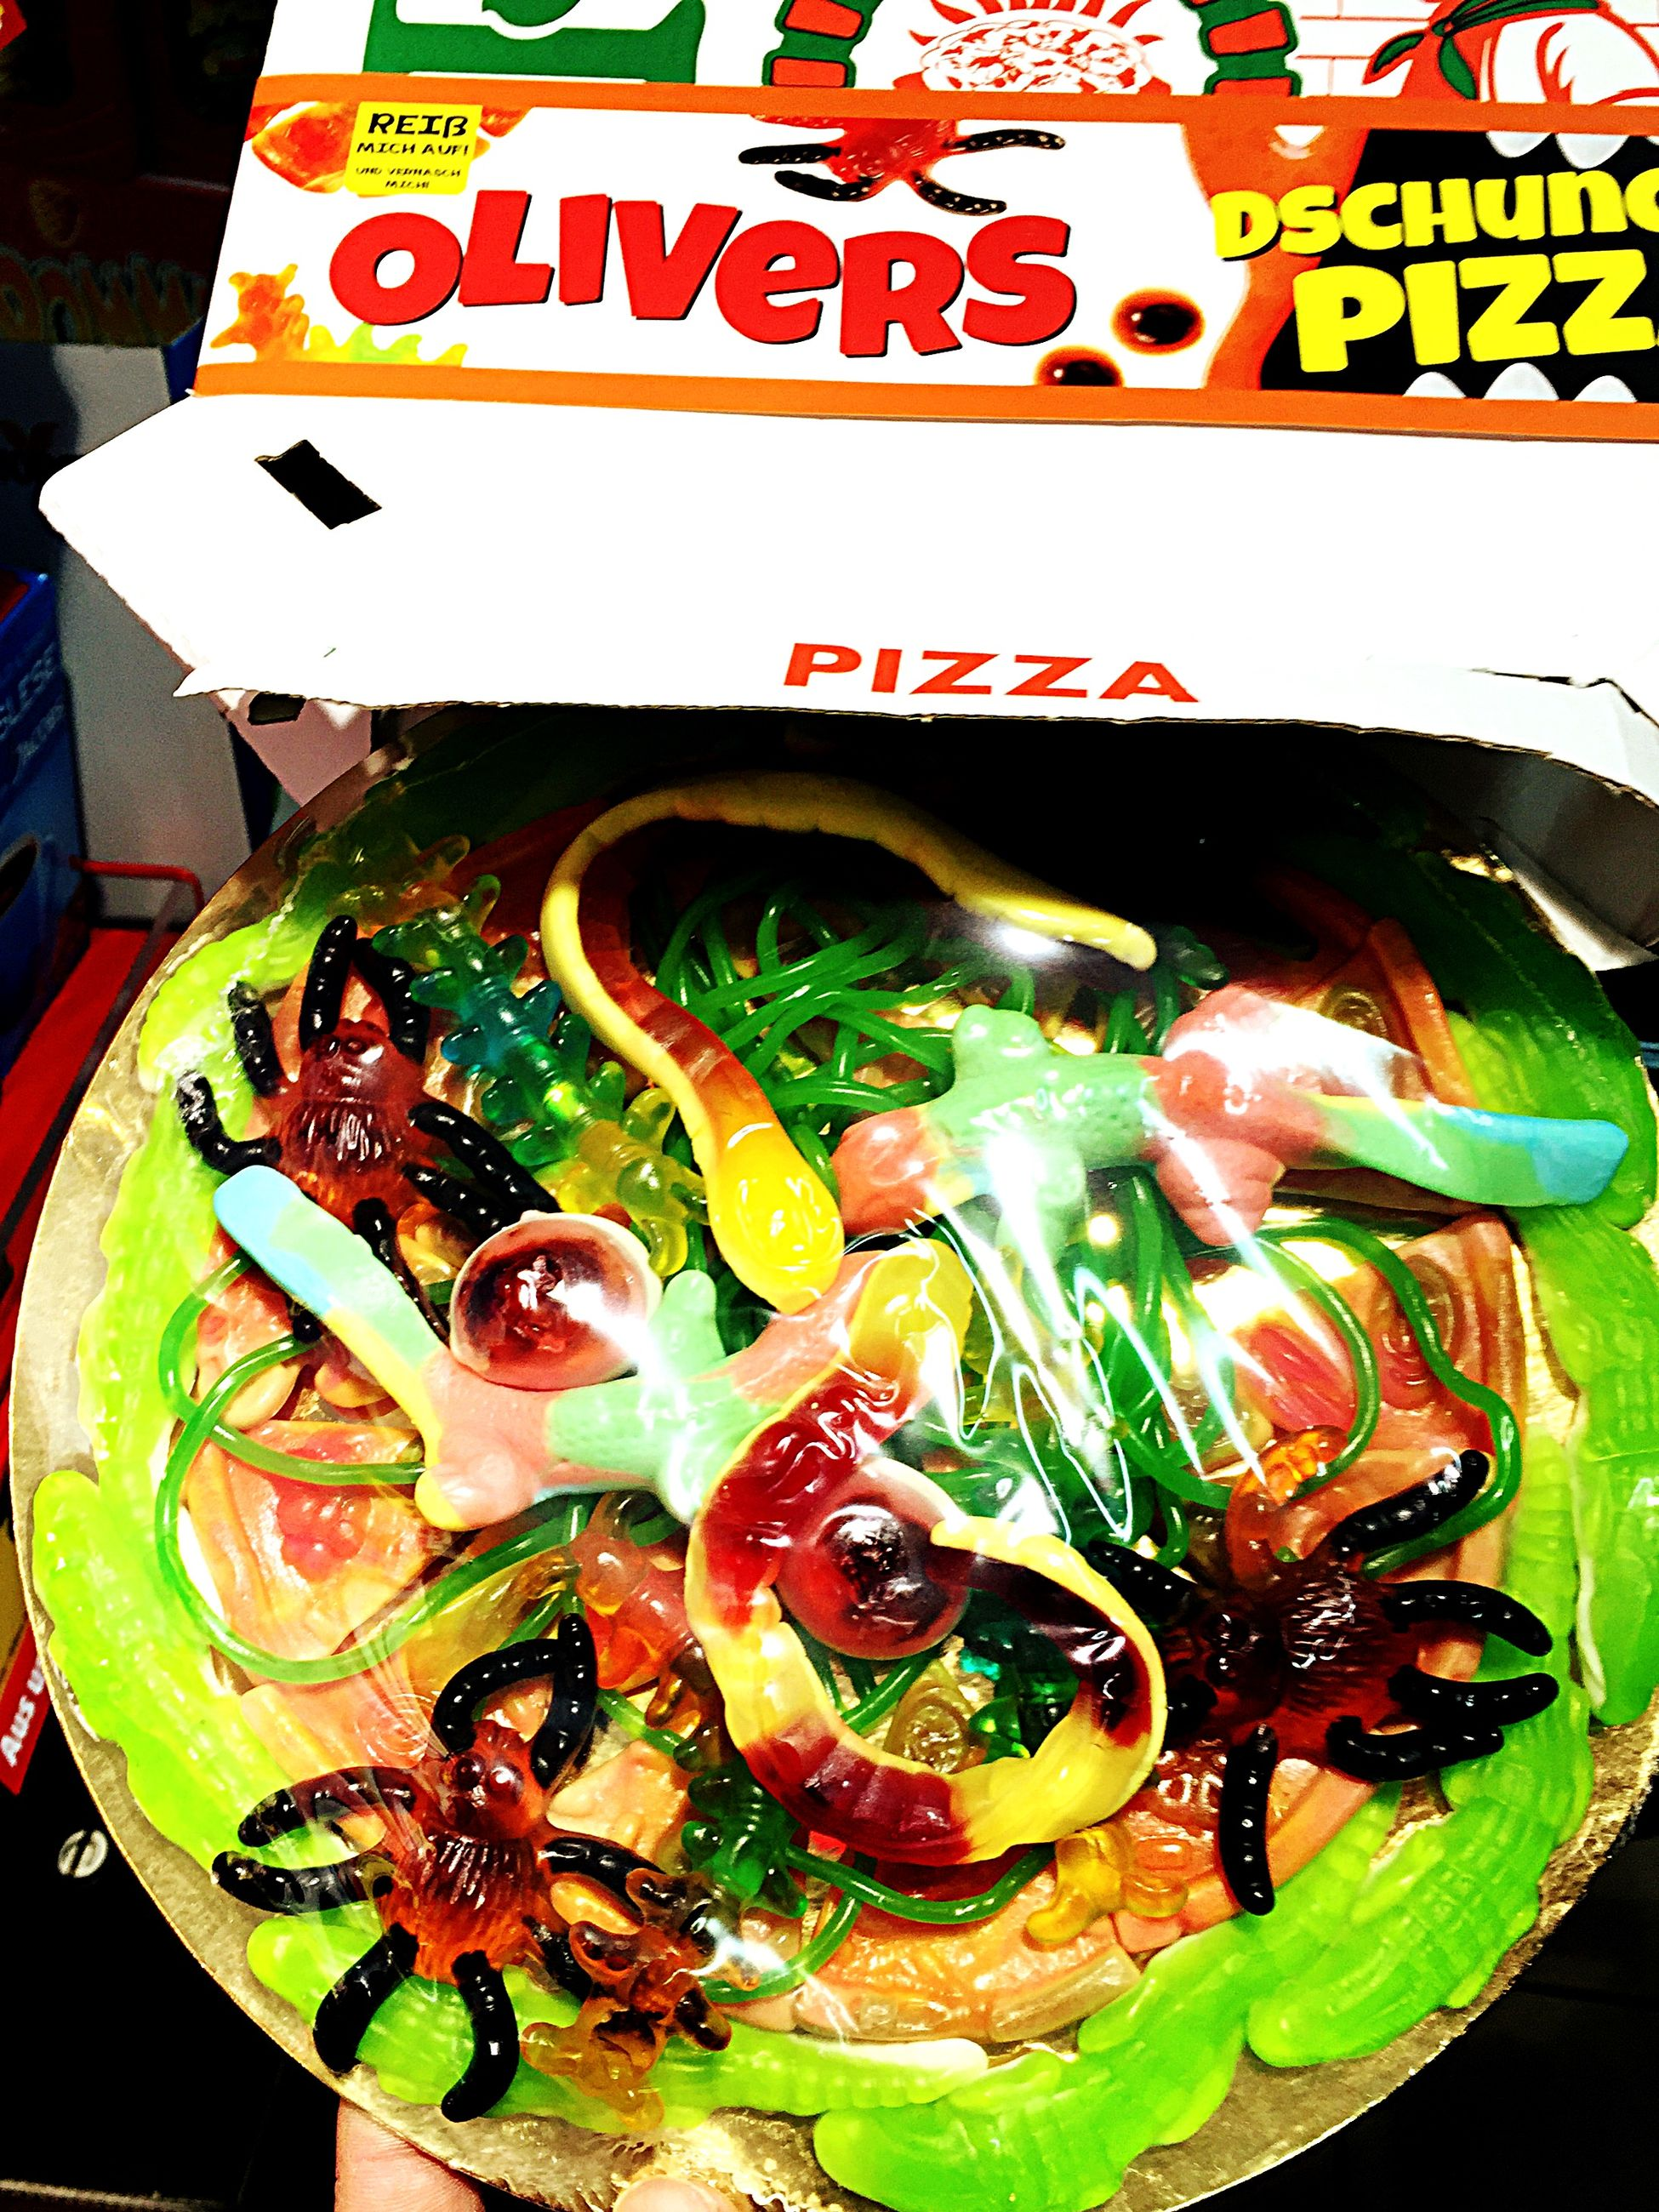 Pizza Dschungelprüfung Konstanz